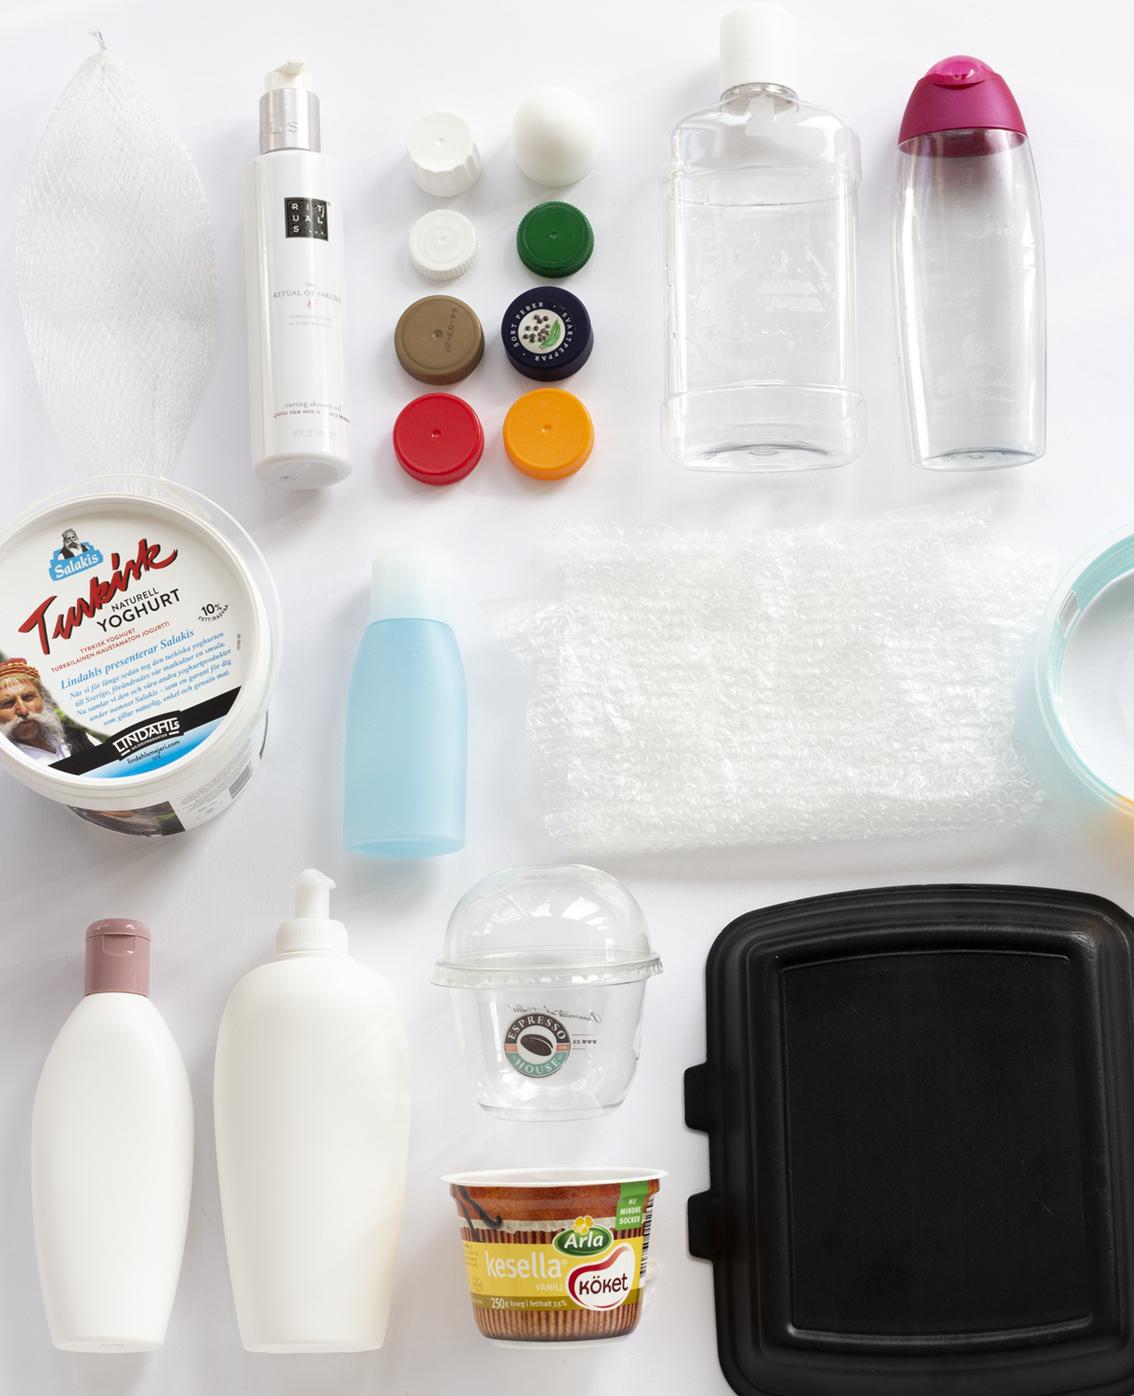 Plast | Pysselbolaget